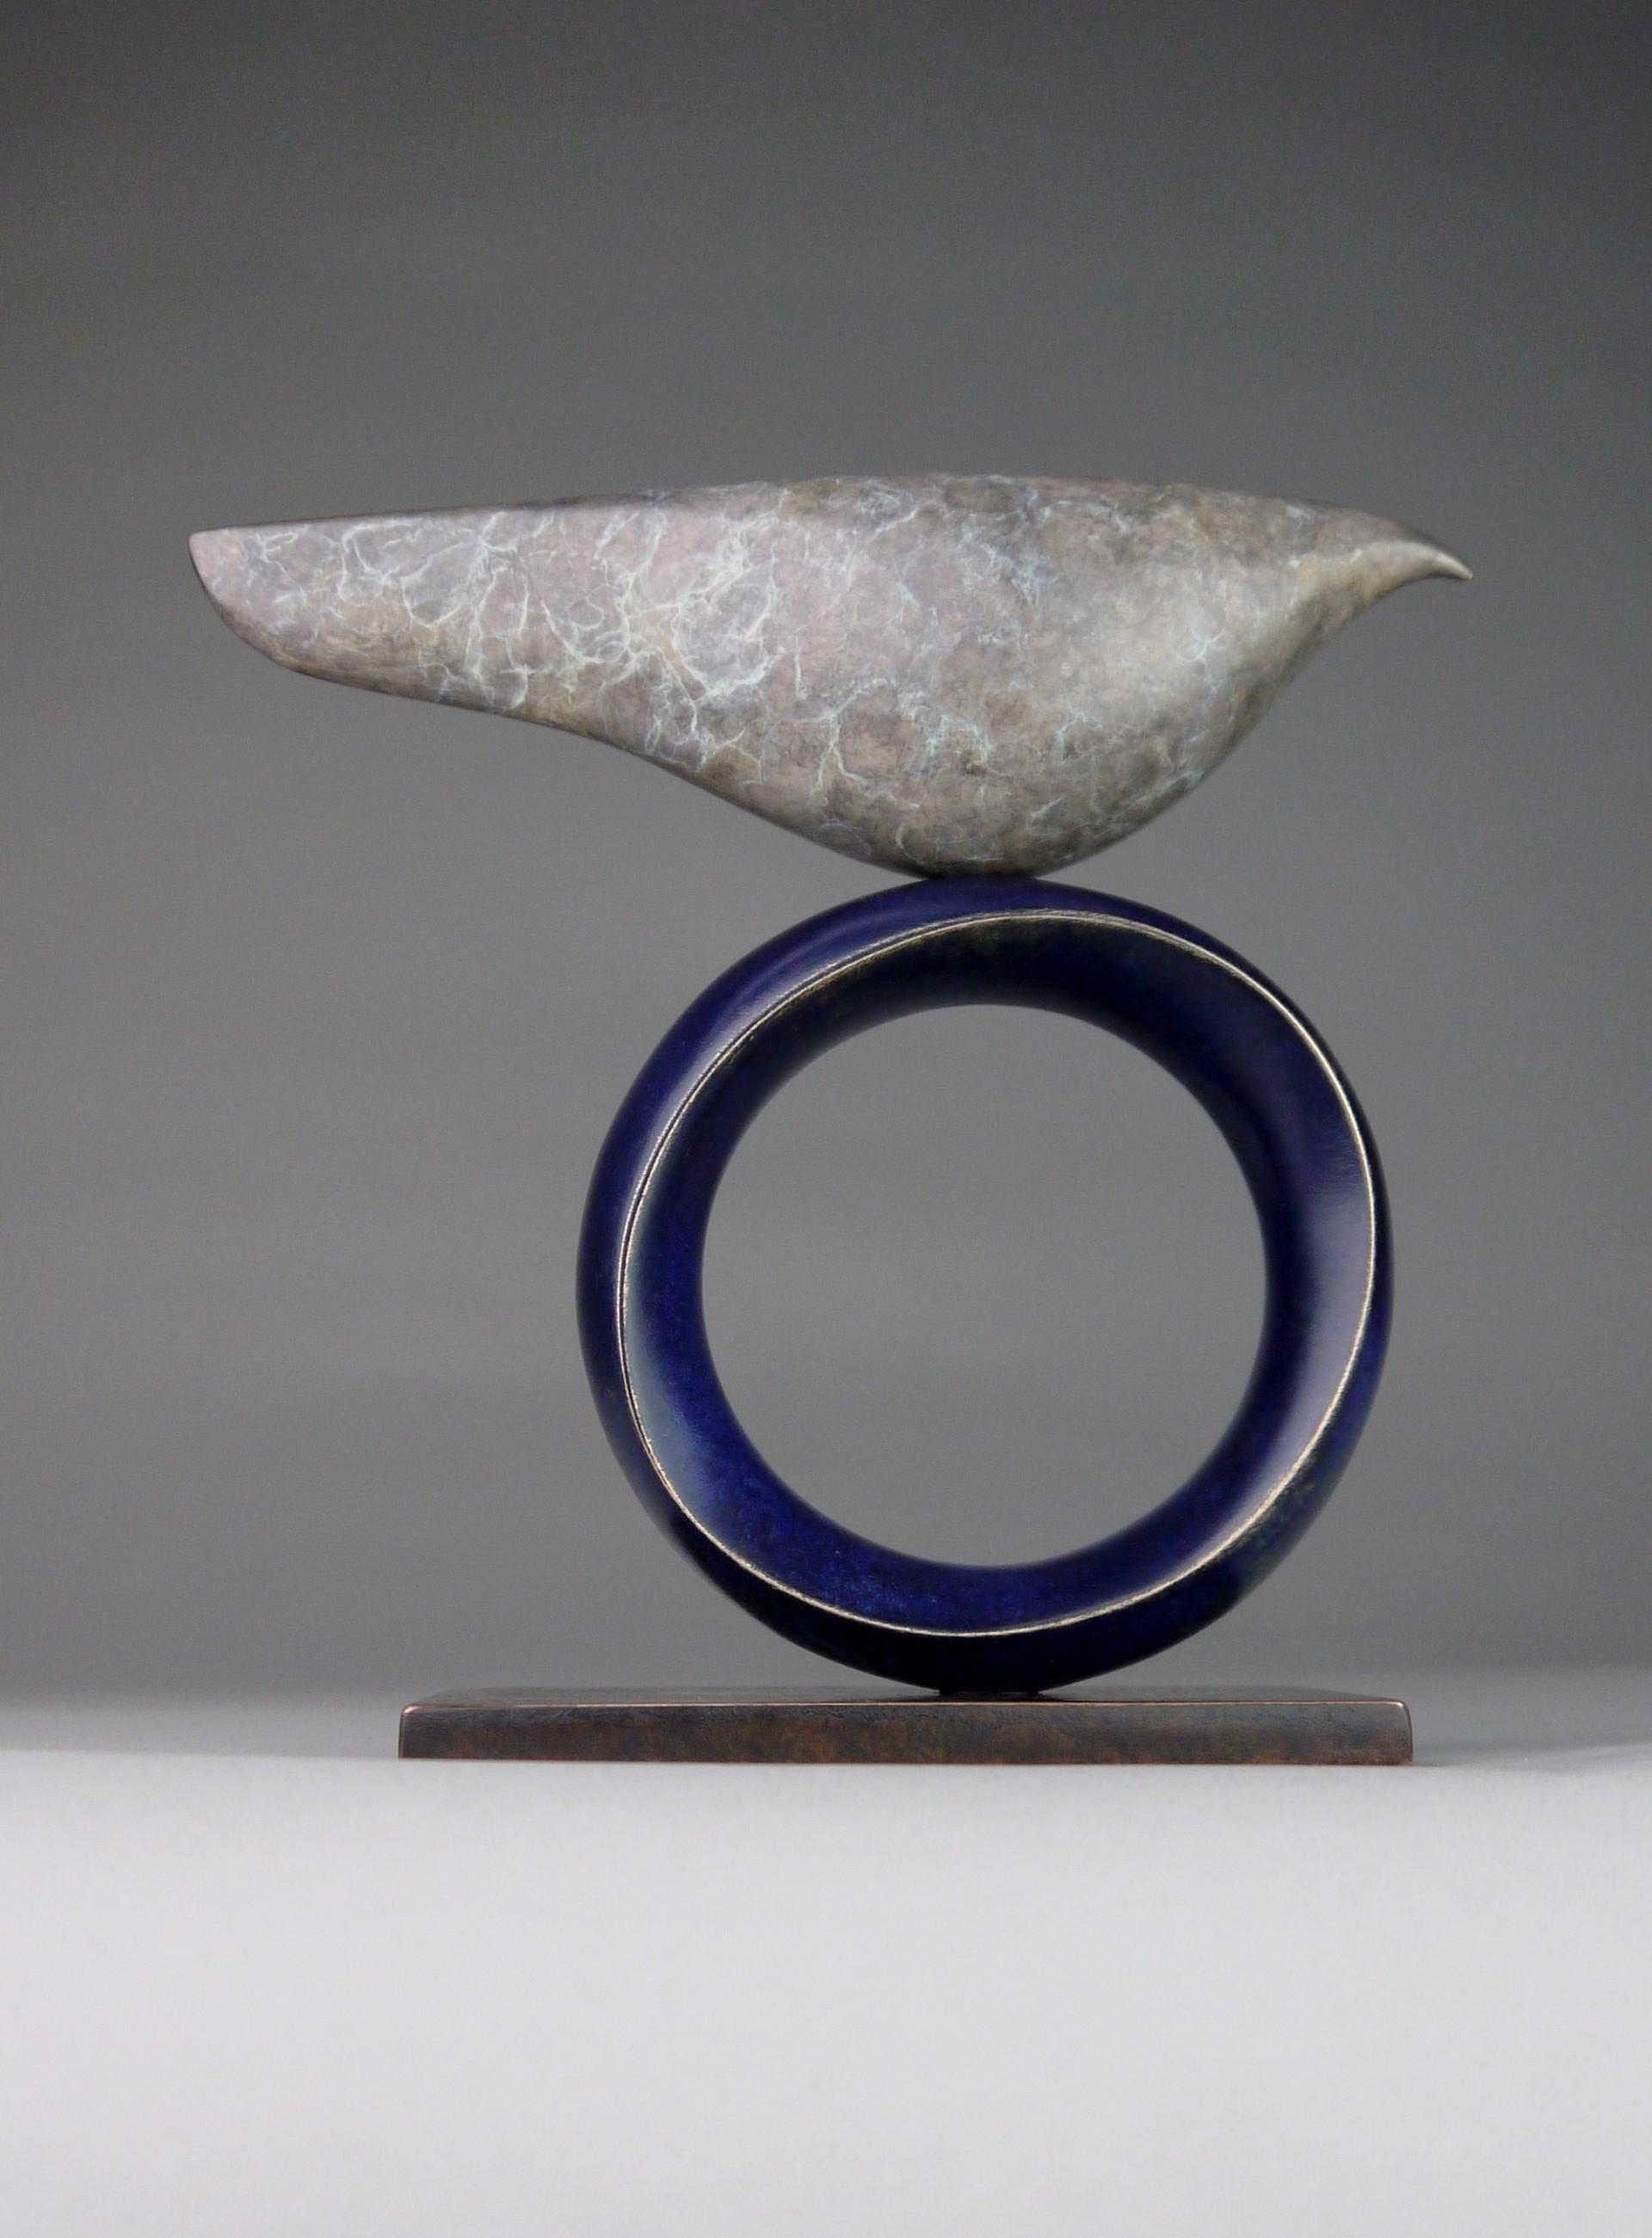 Venus Bird by Stephen Page